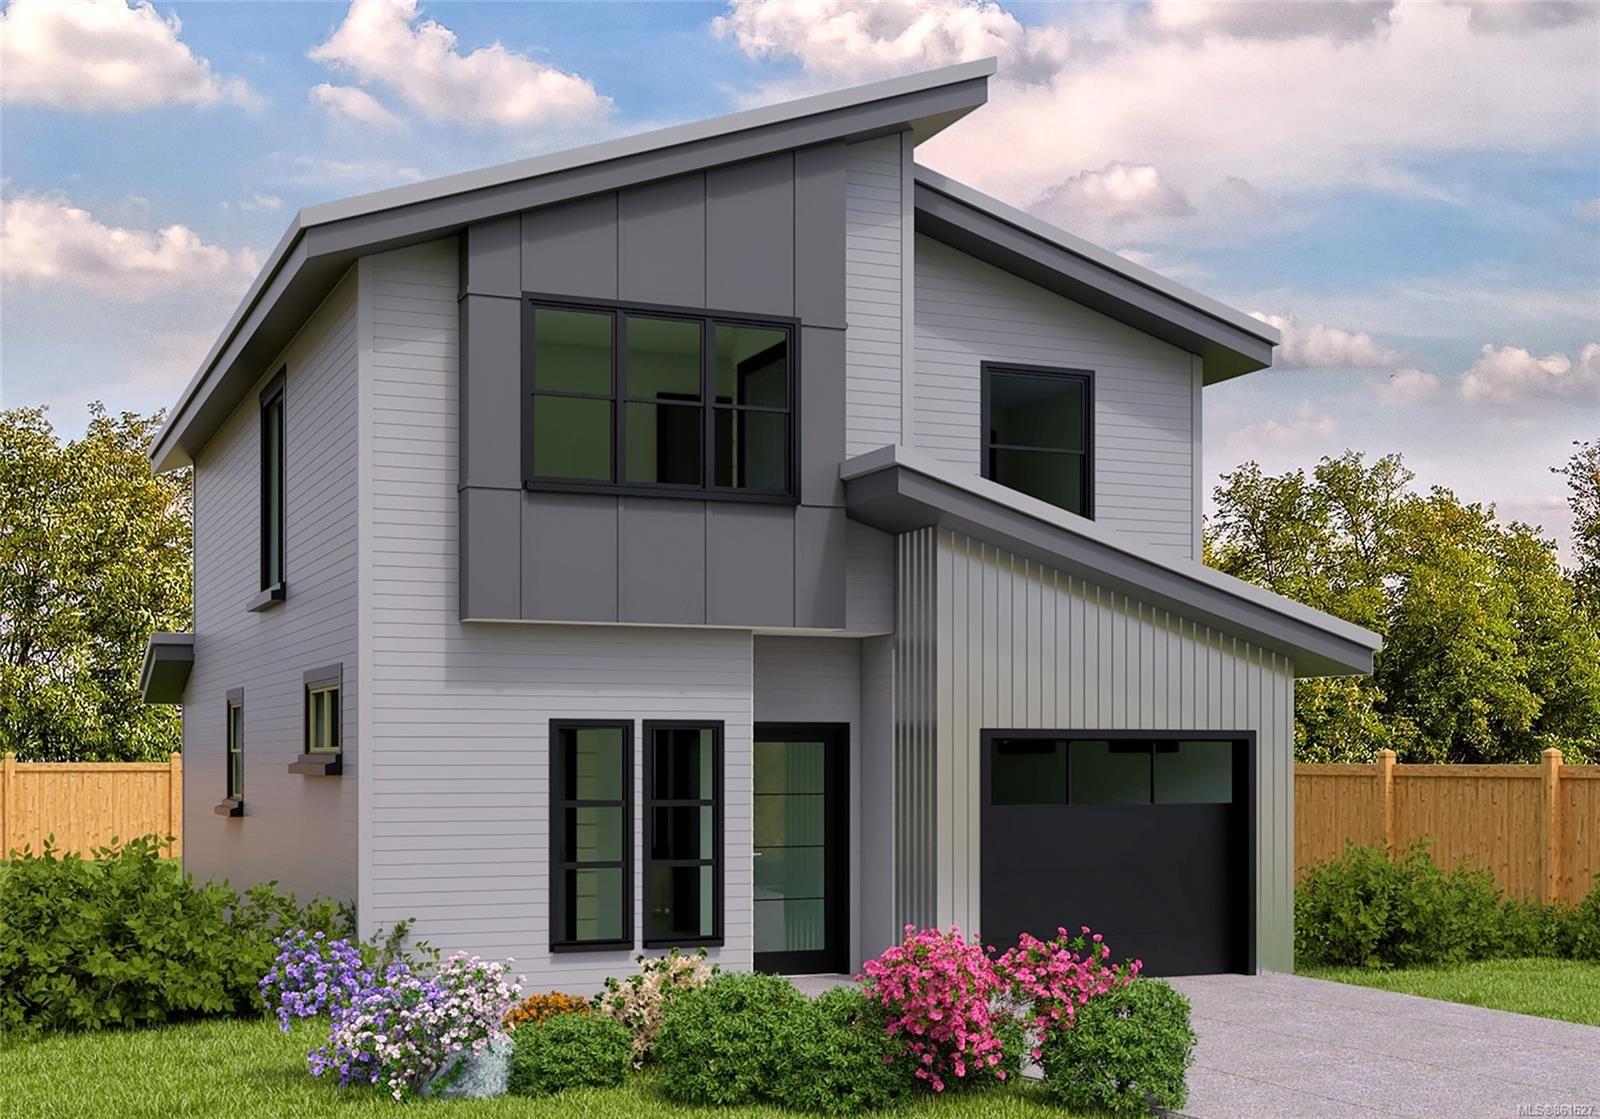 Main Photo: 125 1051 Shawnigan Lake Rd in : ML Shawnigan House for sale (Malahat & Area)  : MLS®# 861627